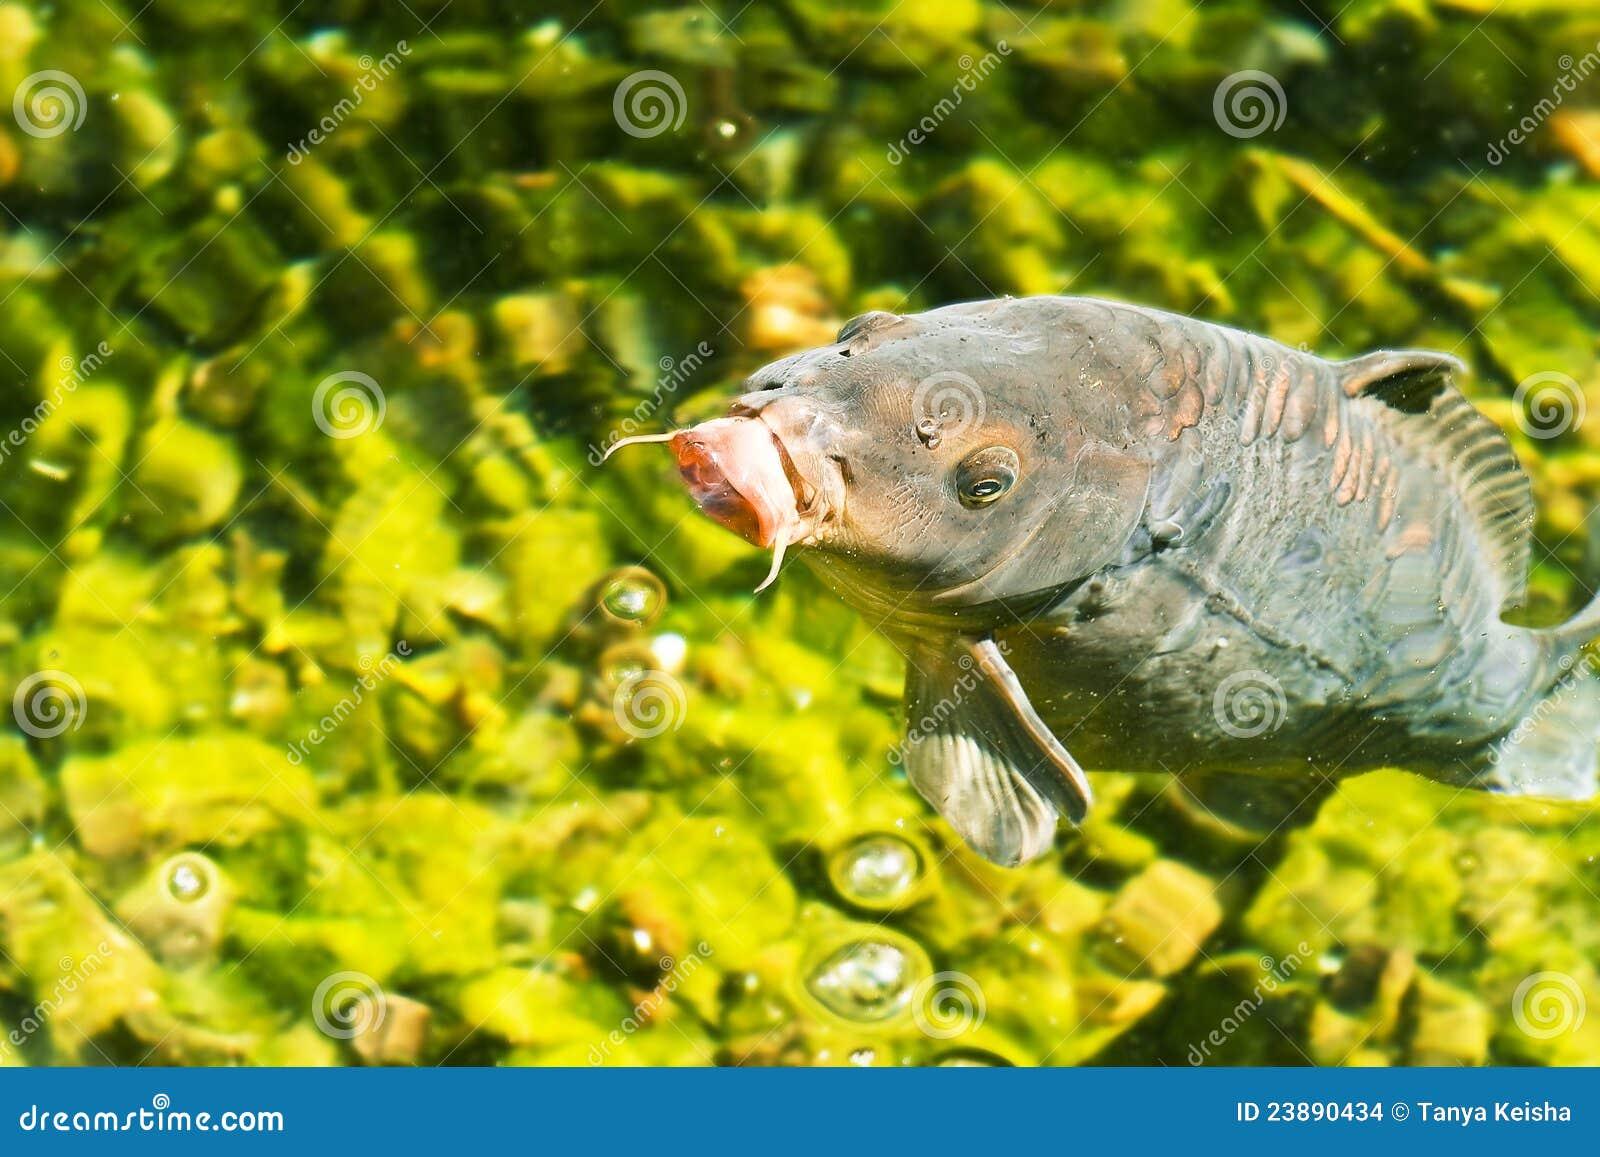 Decorative carp in emerald water stock images image for Decorative carp